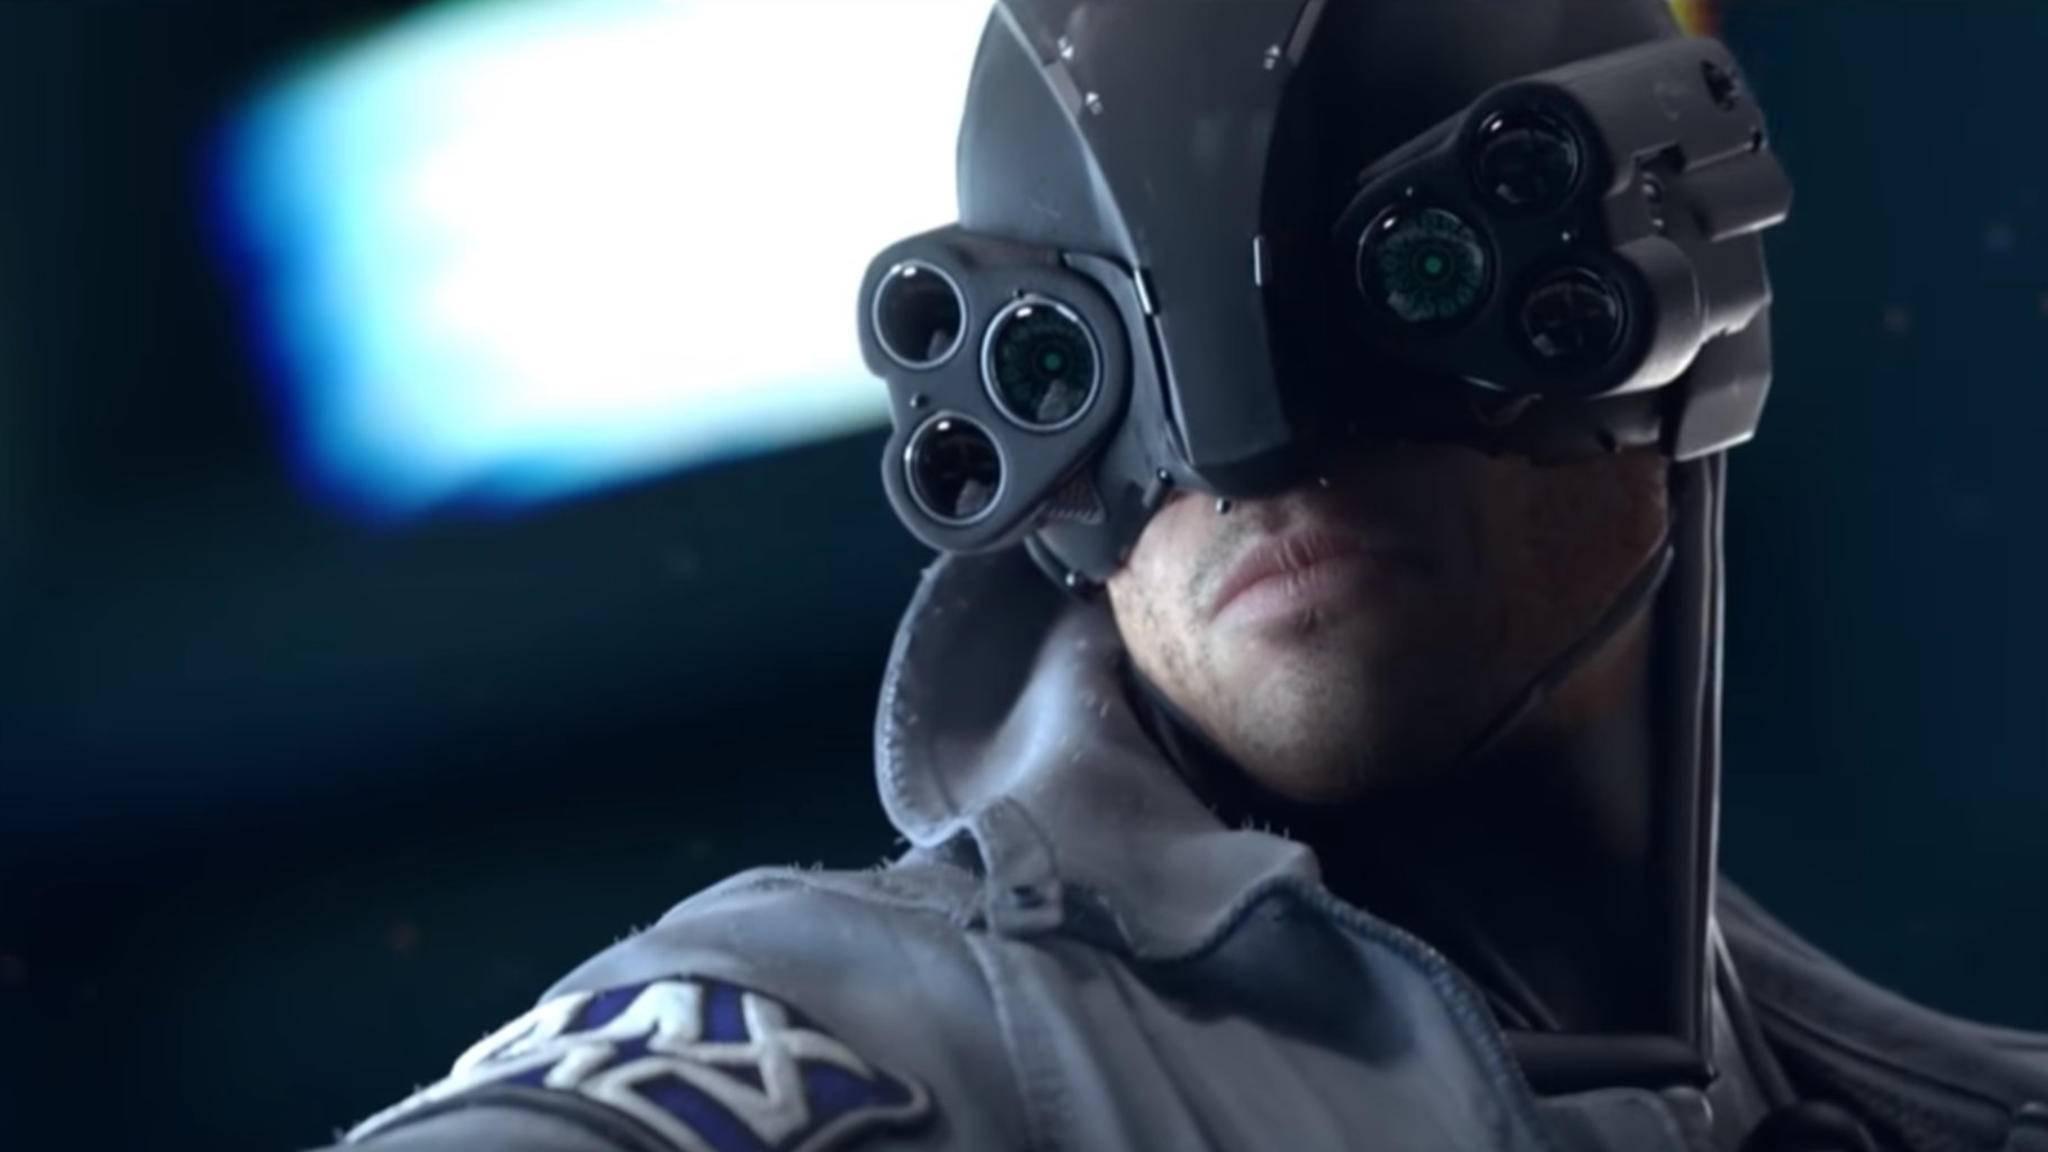 """Cyberpunk 2077"": Bringt die E3 2018 endlich Gameplay-Material?"